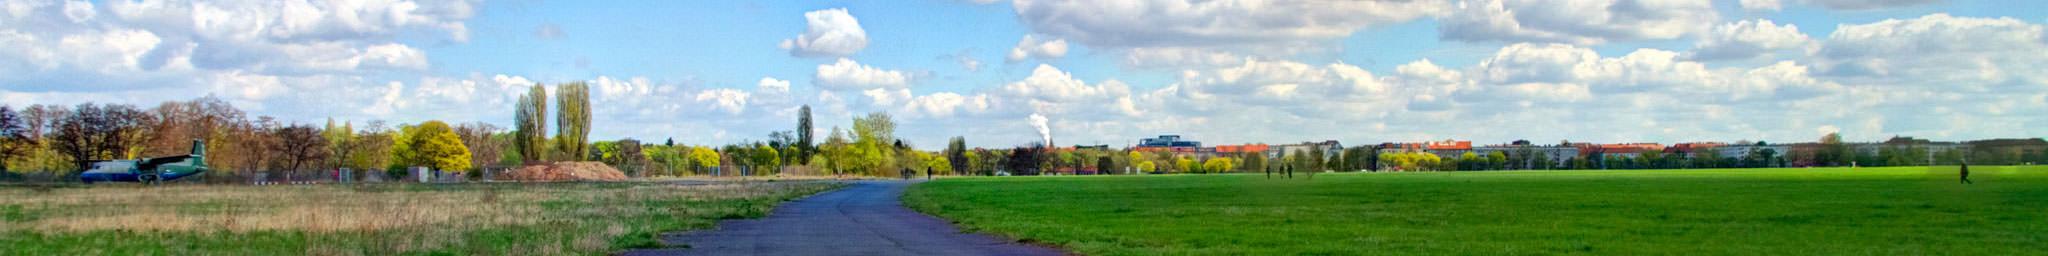 Panorama vom Tempelhofer Feld